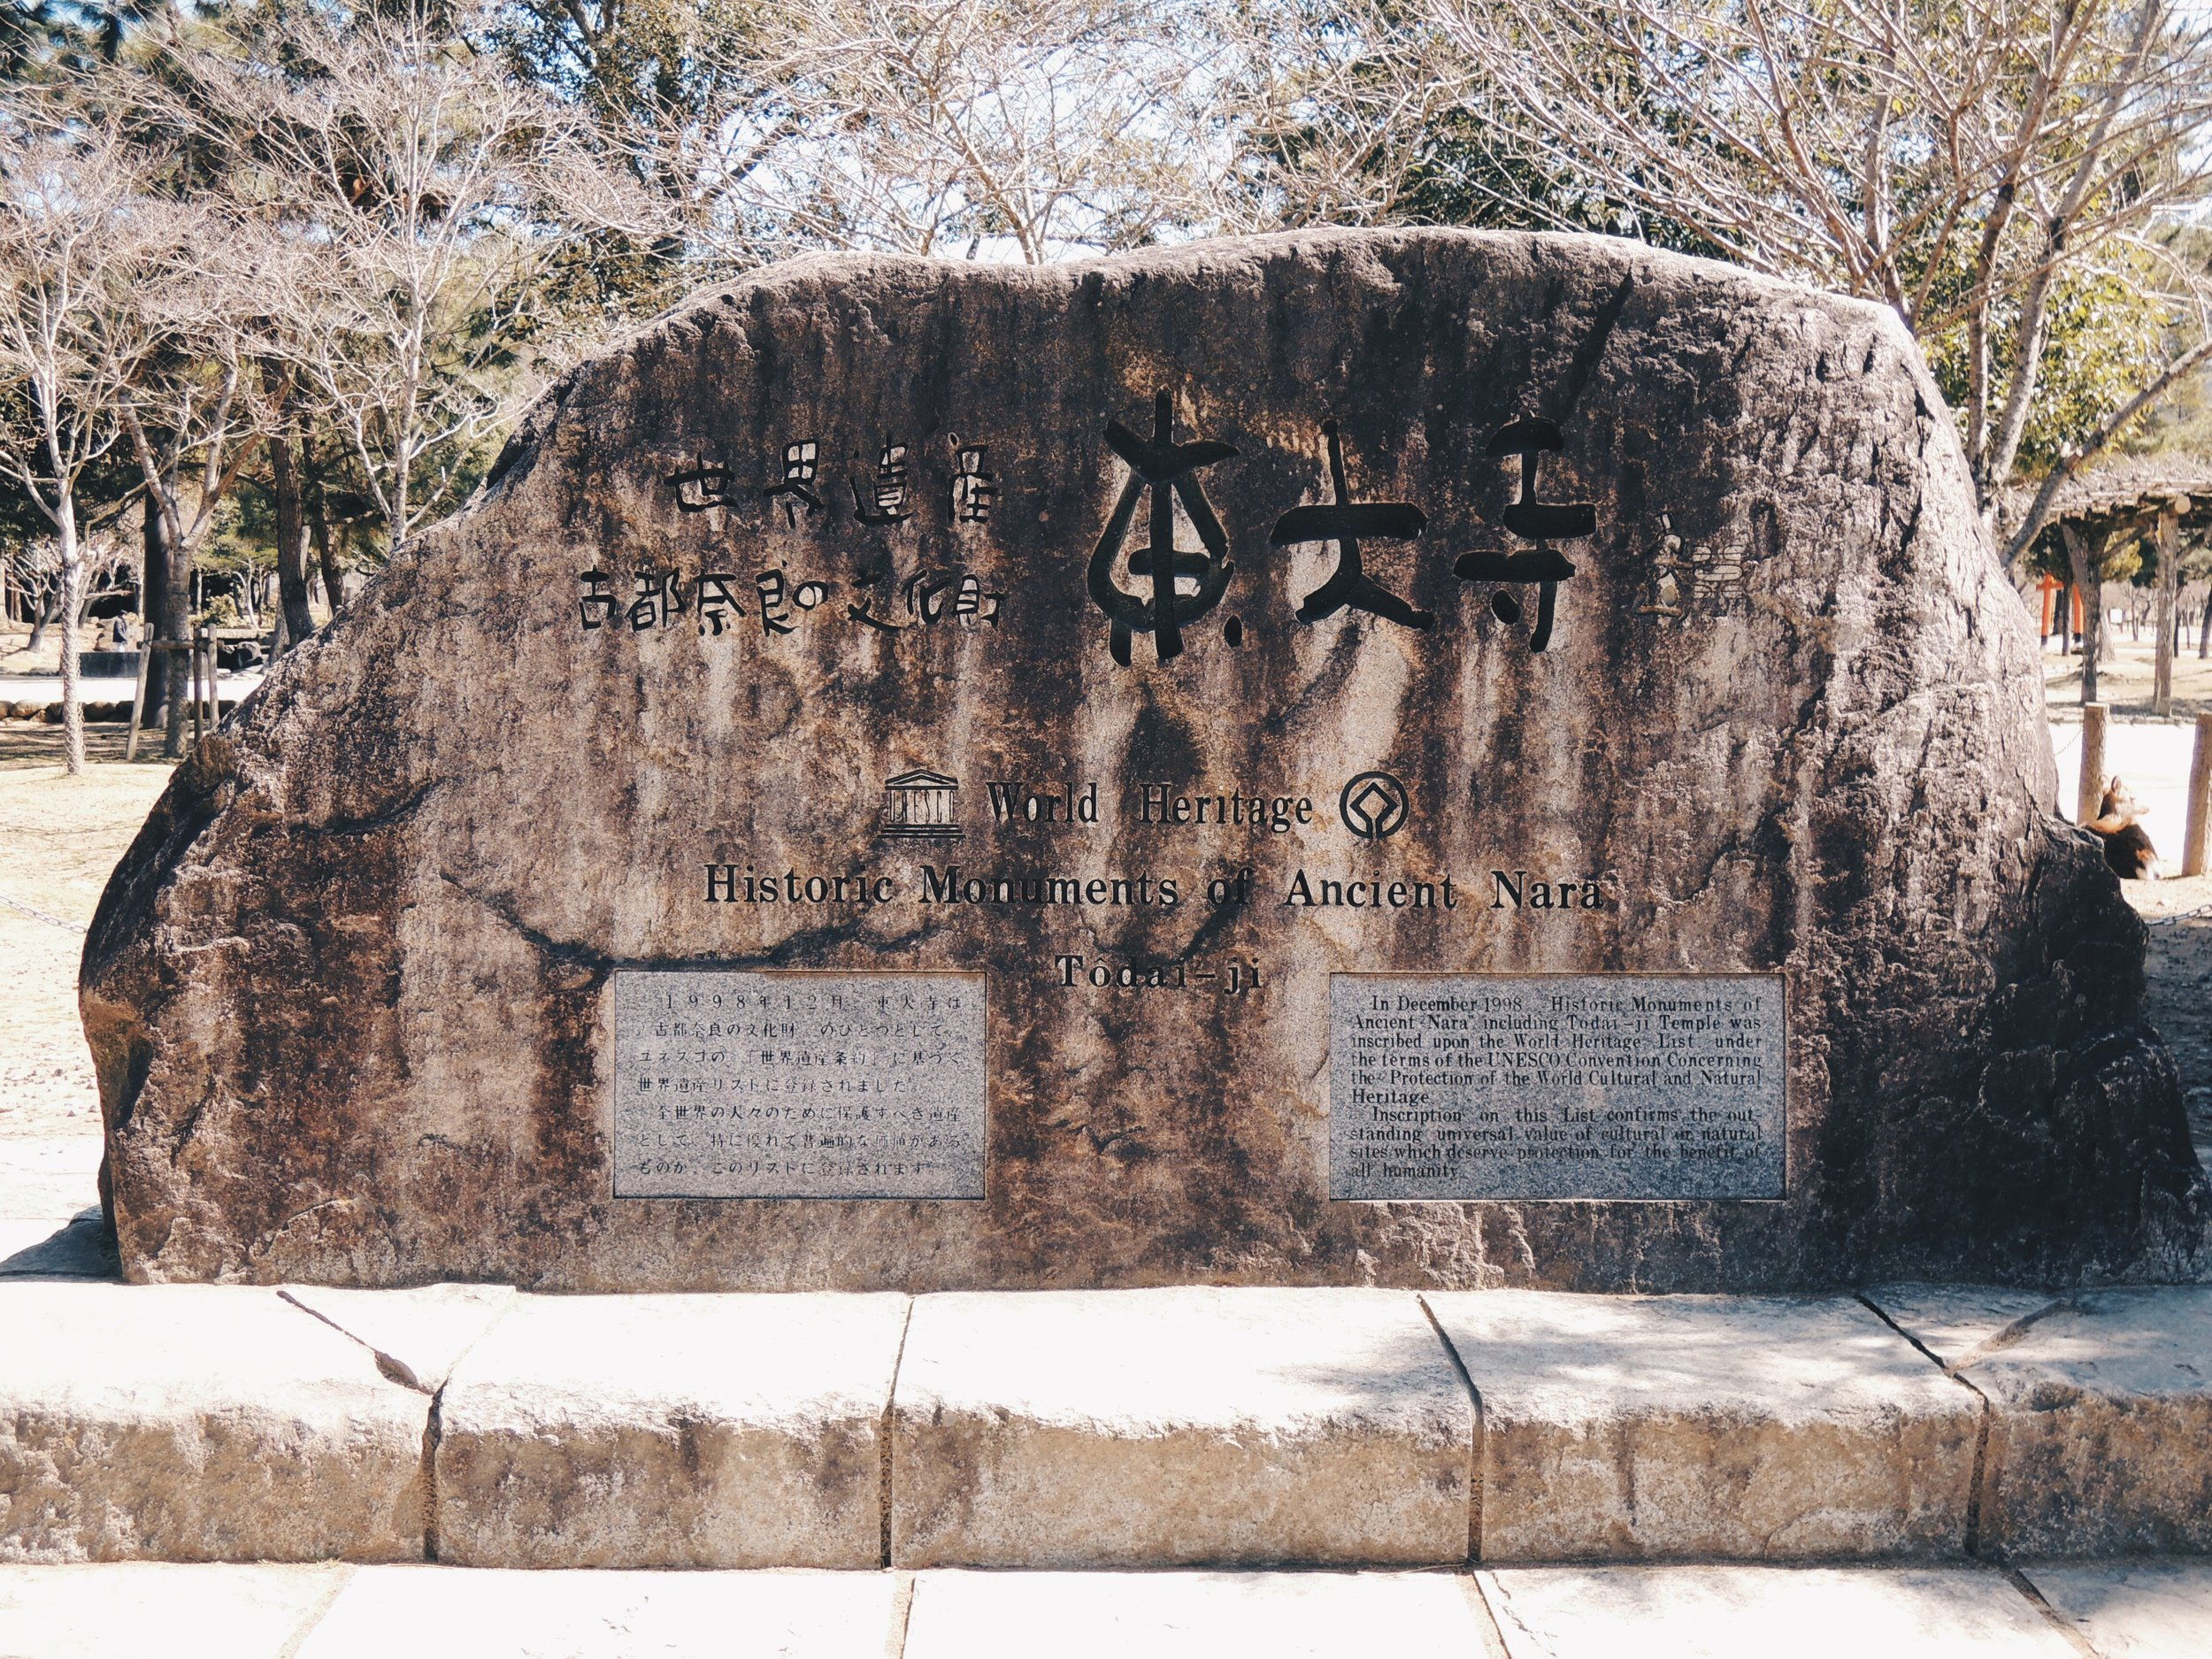 Eight sites in Nara have been designated UNESCO World Heritage Sites